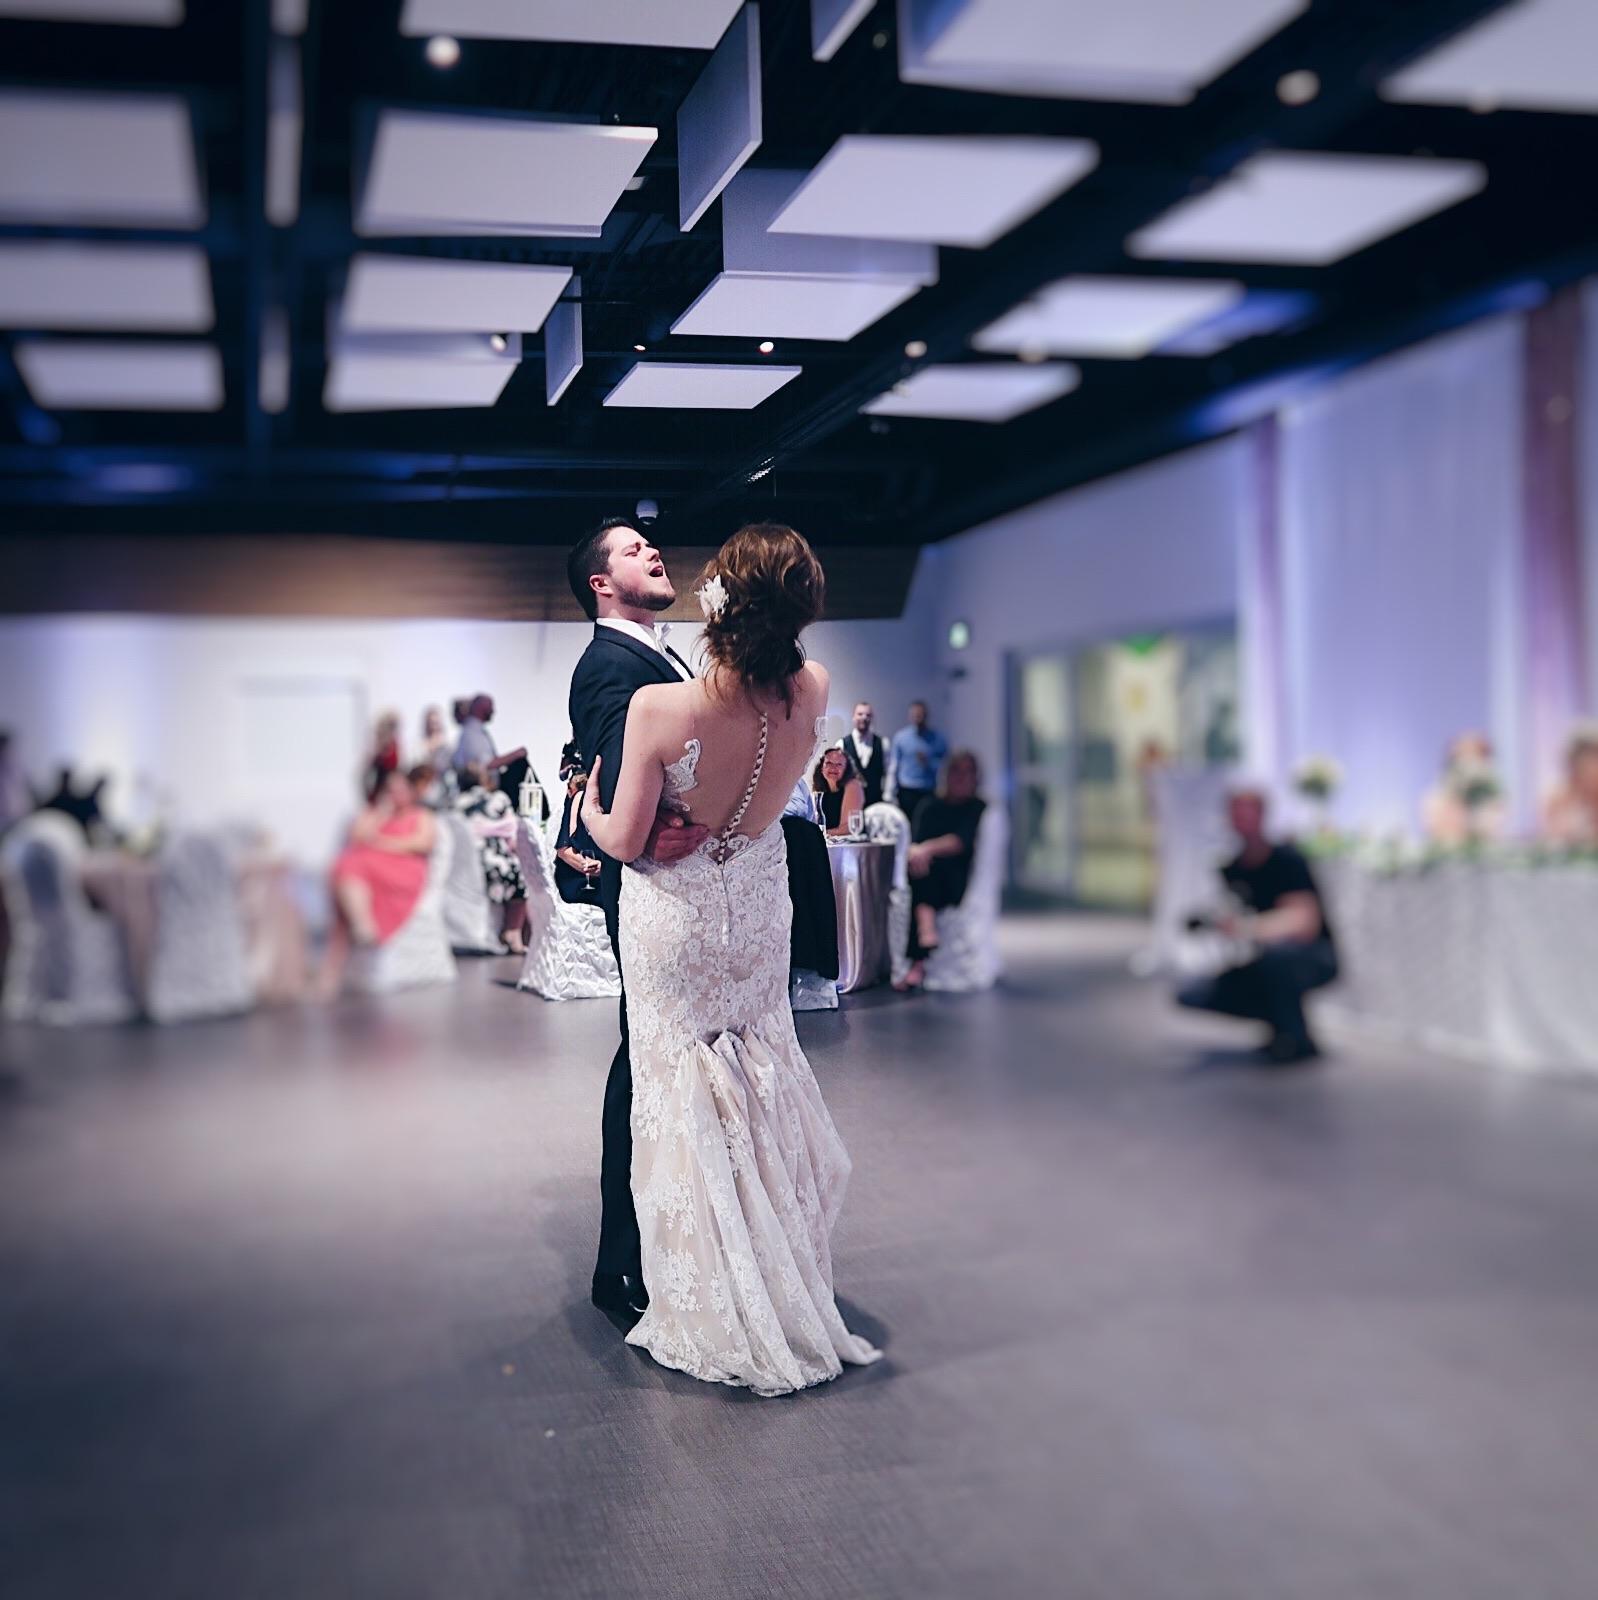 wedding dance, 2 people, bride and groom